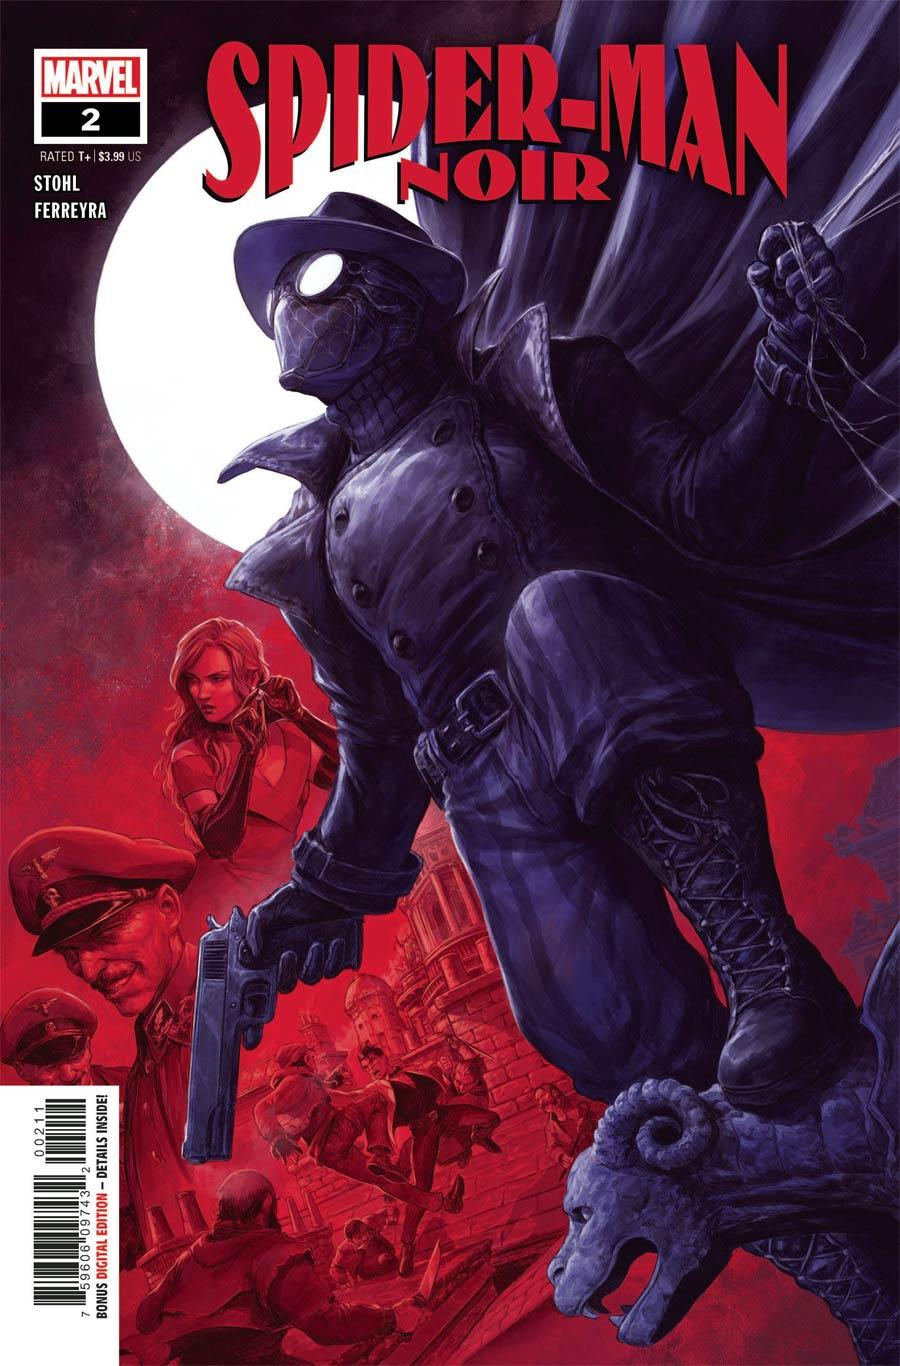 Spider-Man Noir Vol 2 #2 Cover A Regular Dave Rapoza Cover